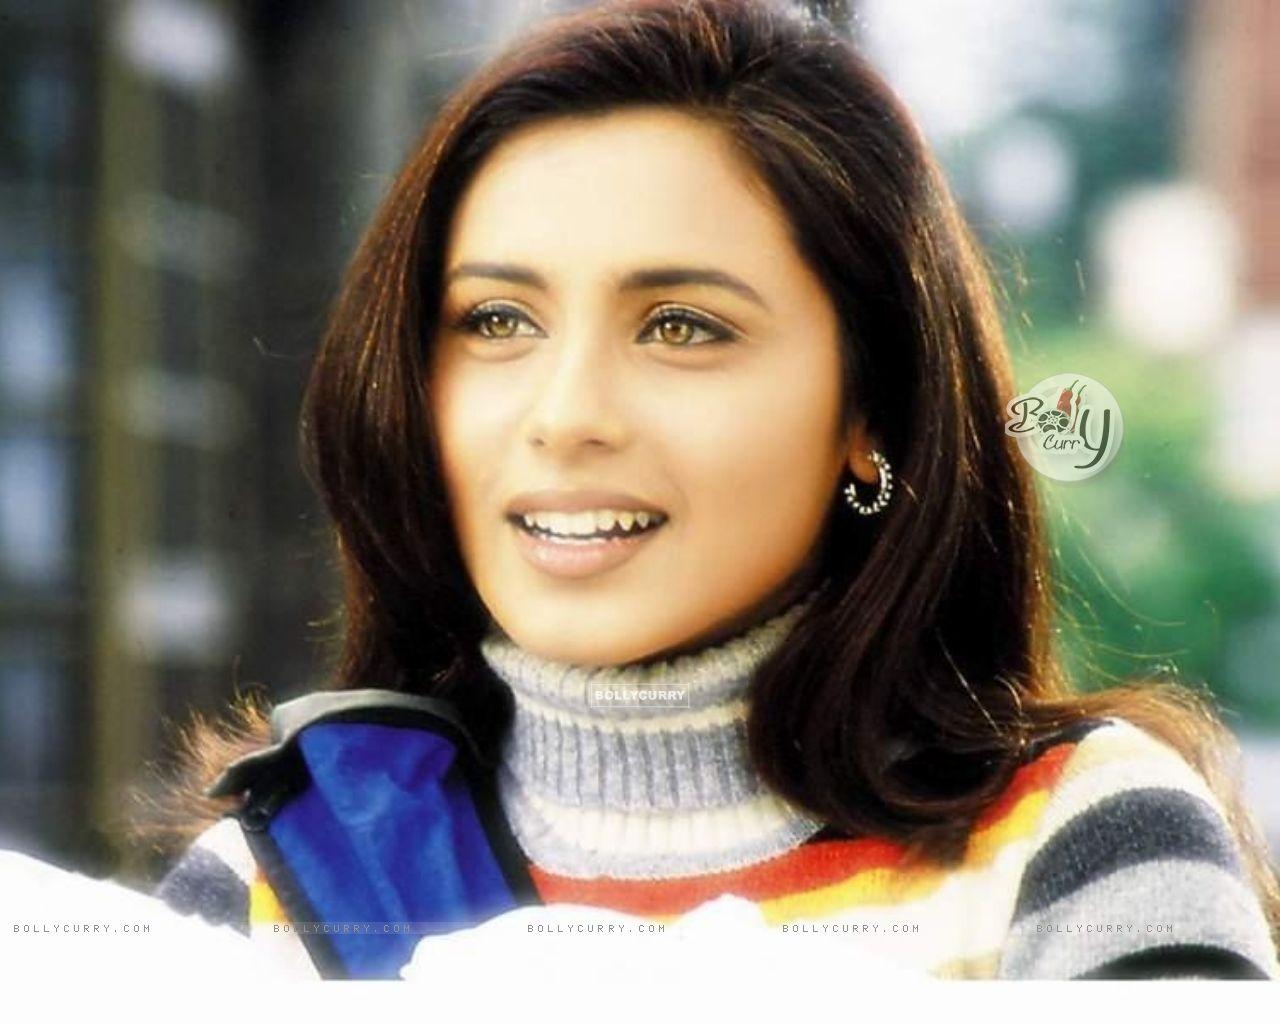 Rani Mukherjee Wallpaper - Rani Mukerji Image Download , HD Wallpaper & Backgrounds